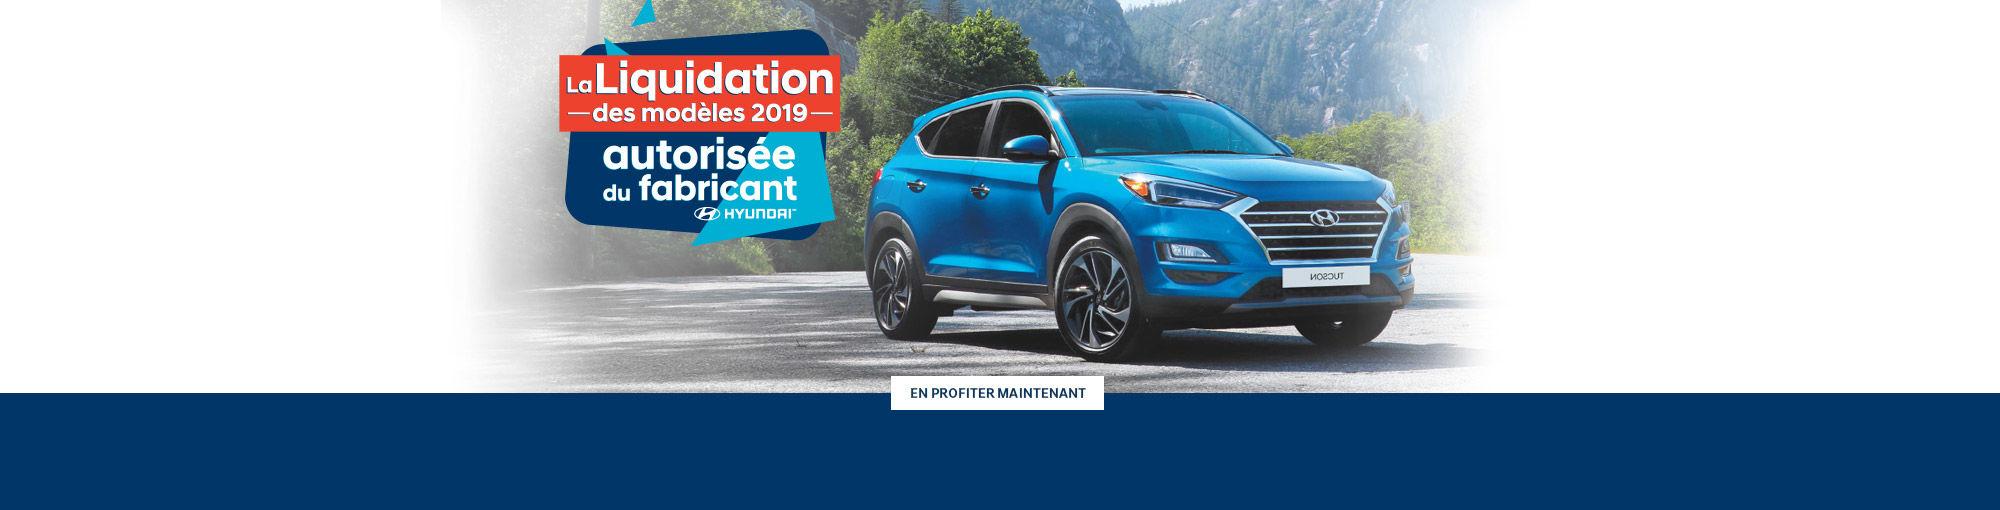 Hyundai Main header Aout 2019 Liquidation Autorisée